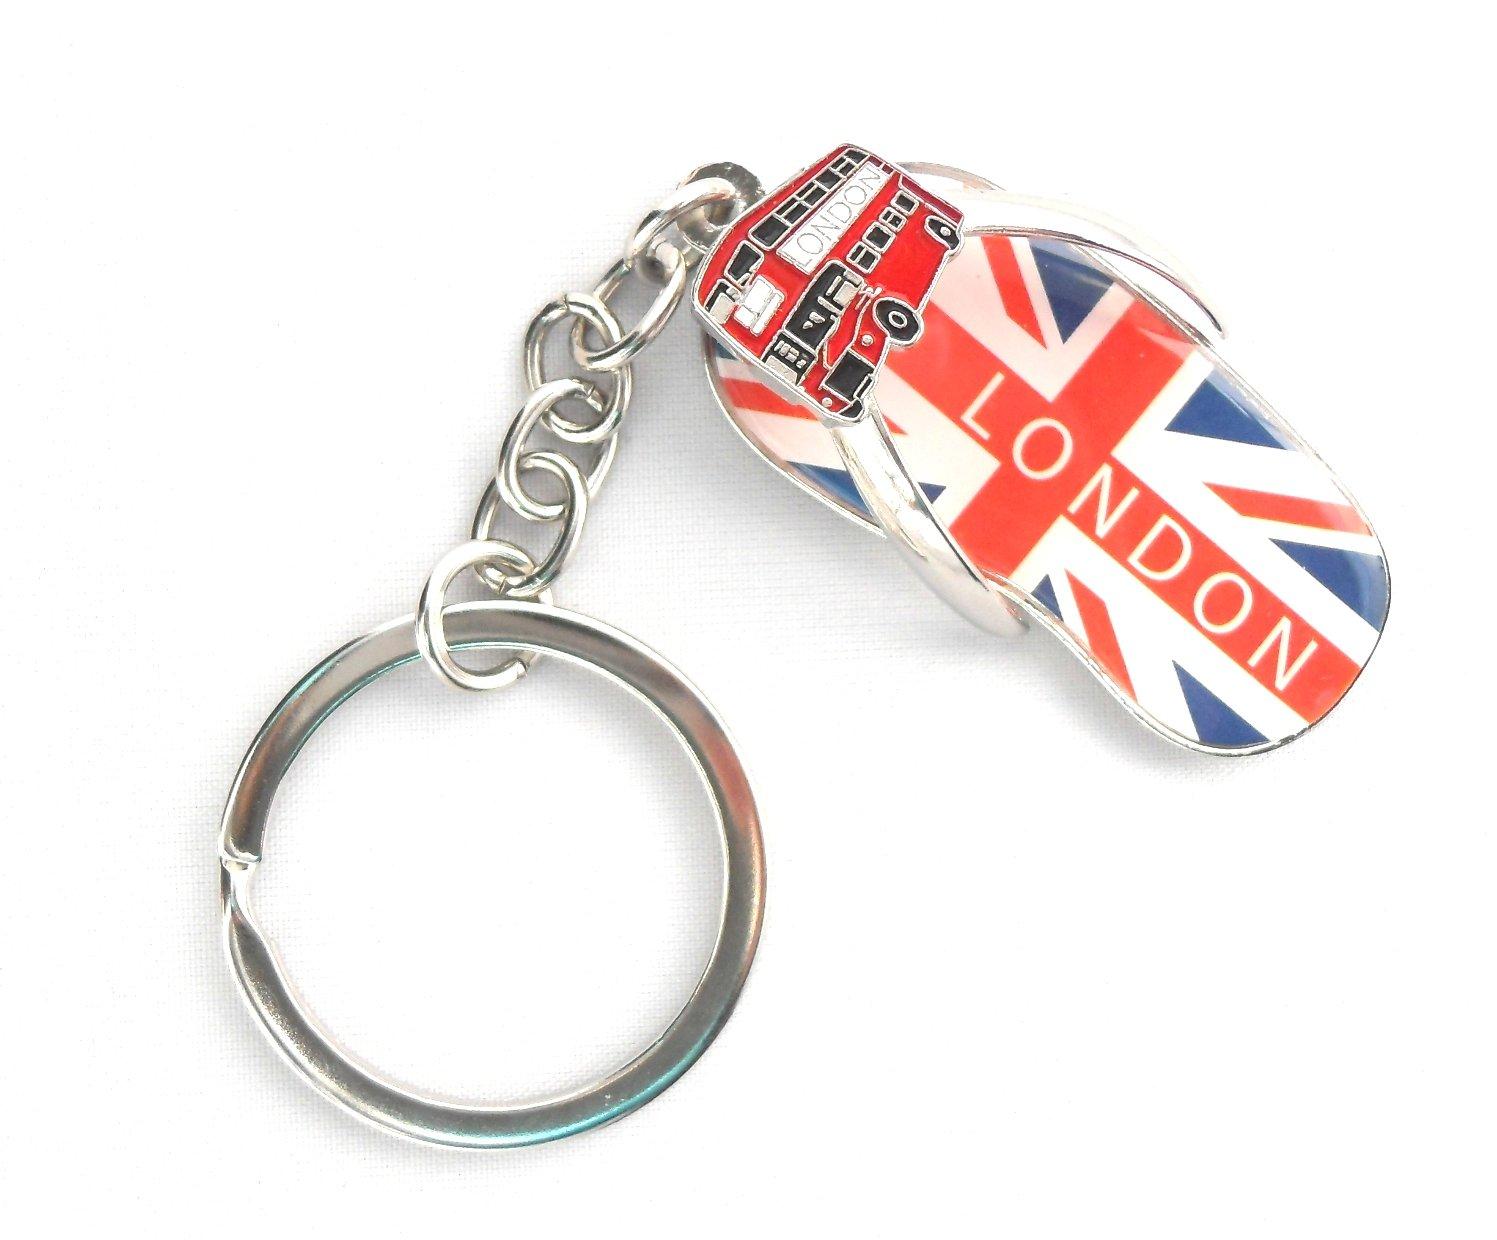 Amazon.com: I Love London Souvenir/I Love London kerying en ...